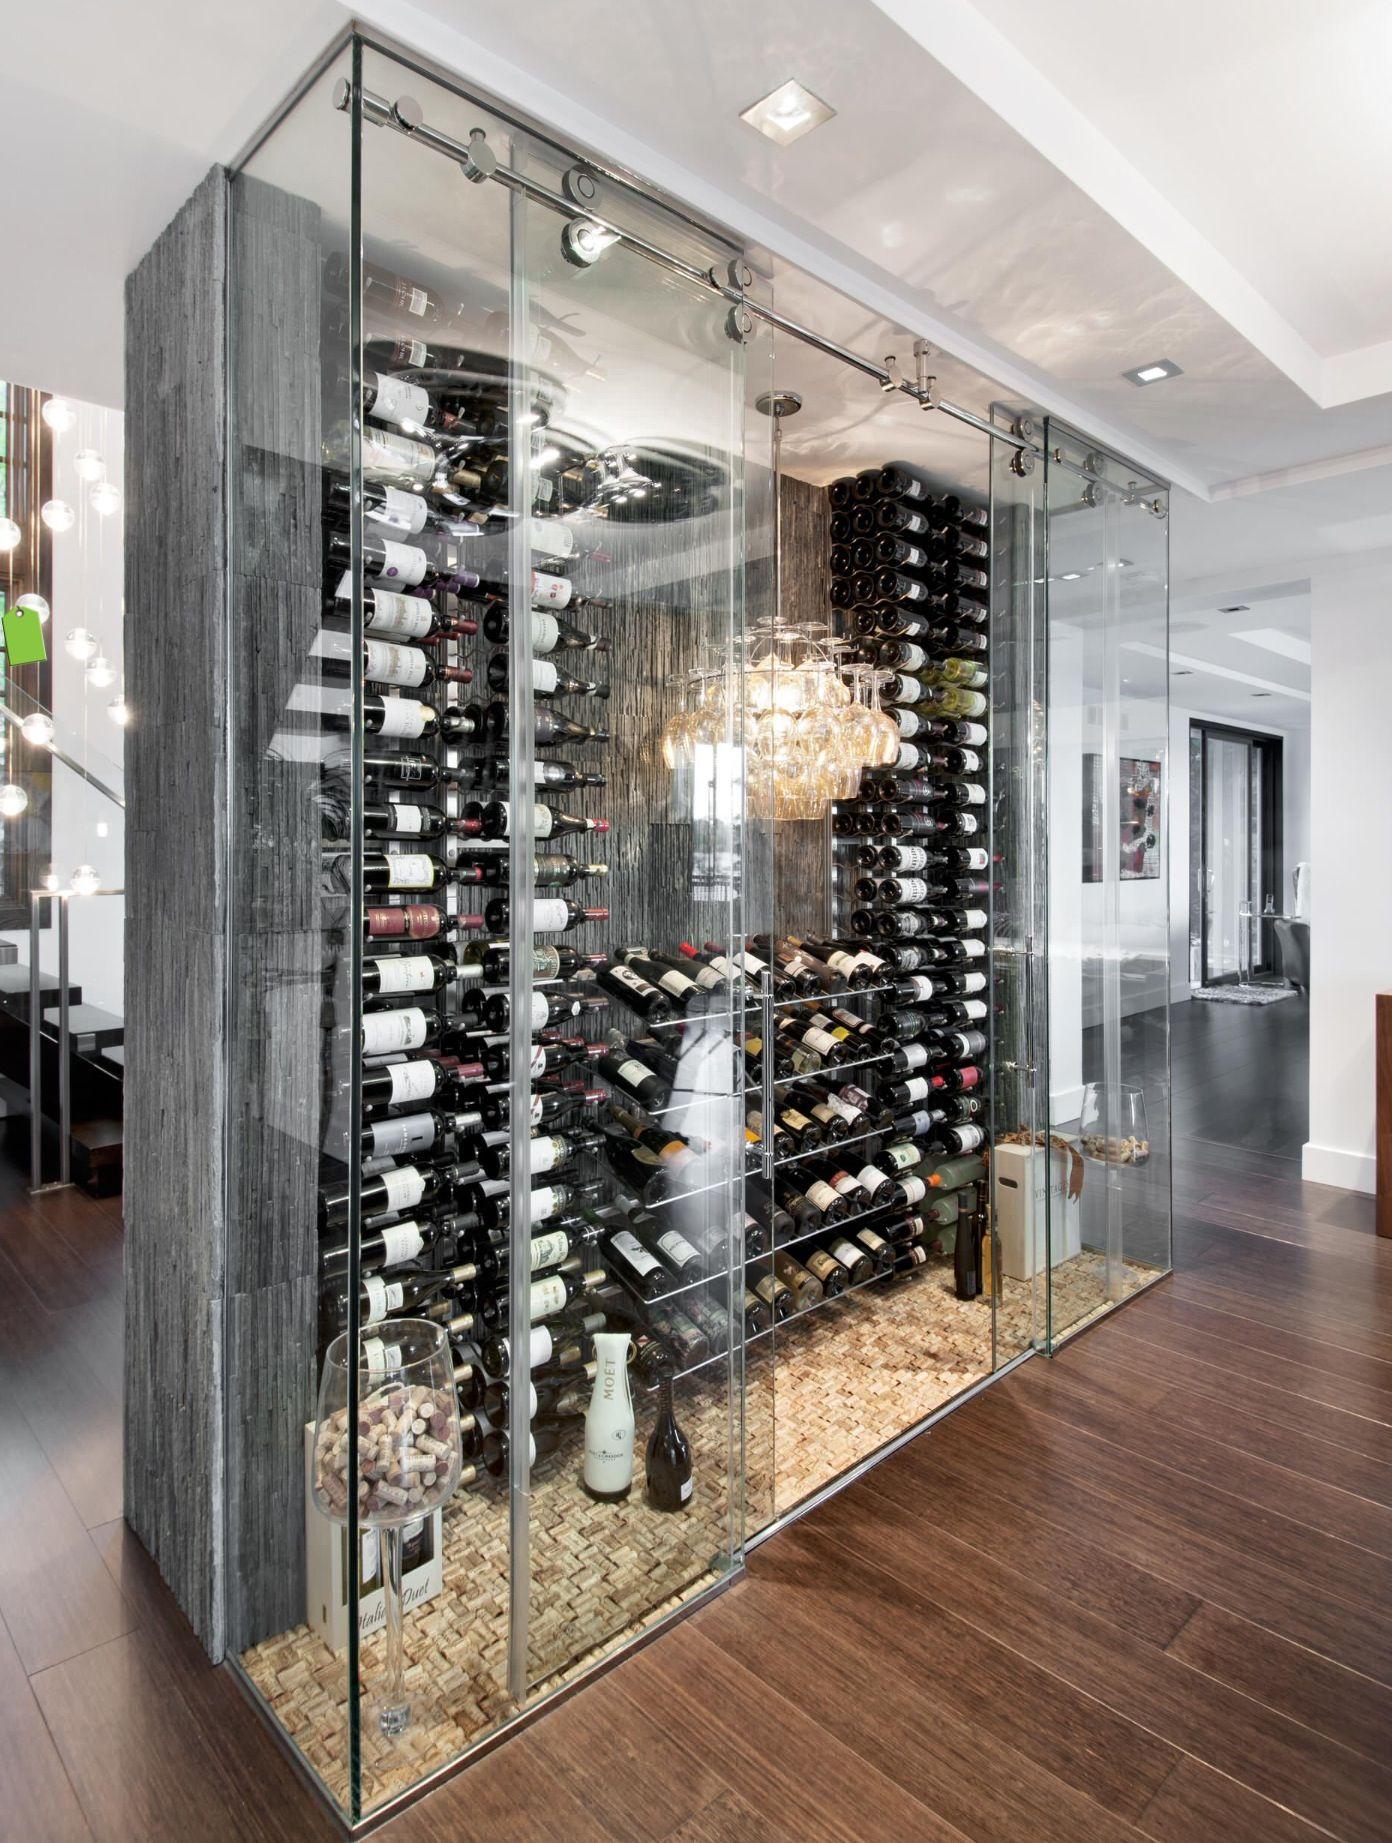 Modern wine storage unit plenty of space for bottles love the sliding glass doors. Modern with a hint of barn. & Modern wine storage unit plenty of space for bottles love the ...